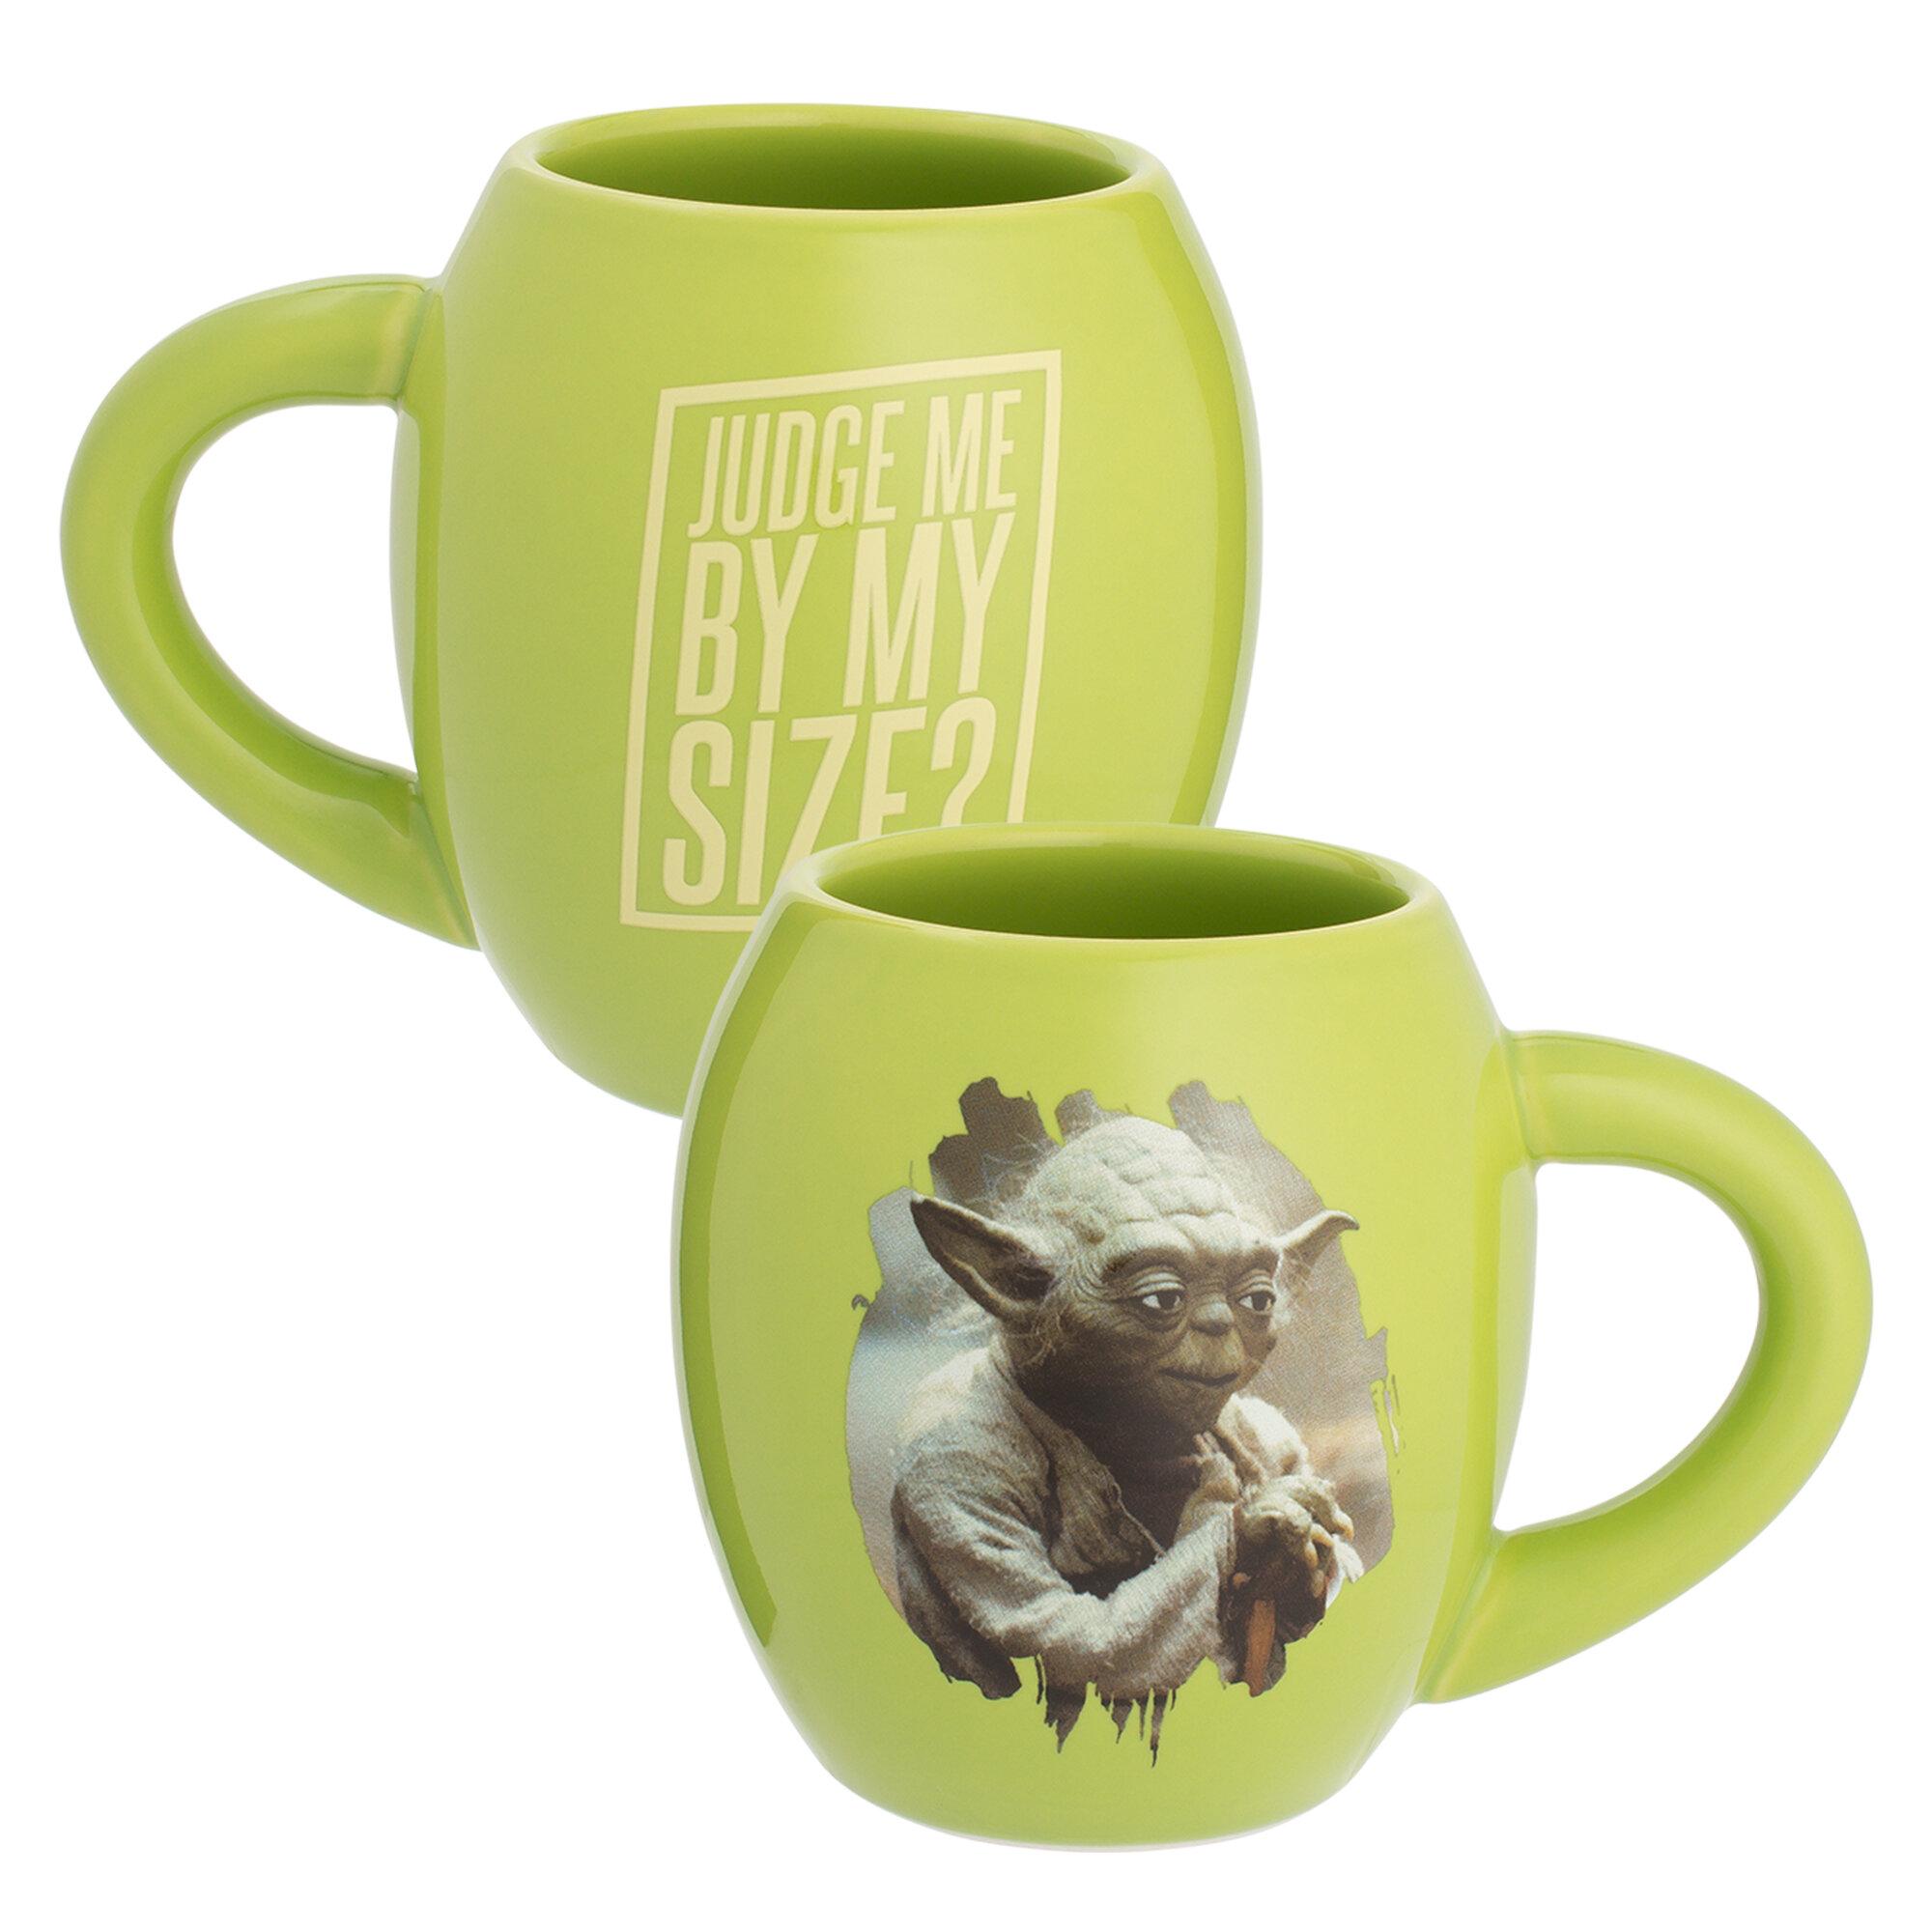 18 OzOval 2 Set Of Wars About Mug Details Coffee Yoda Vandor Llc Star qUGpSzMV